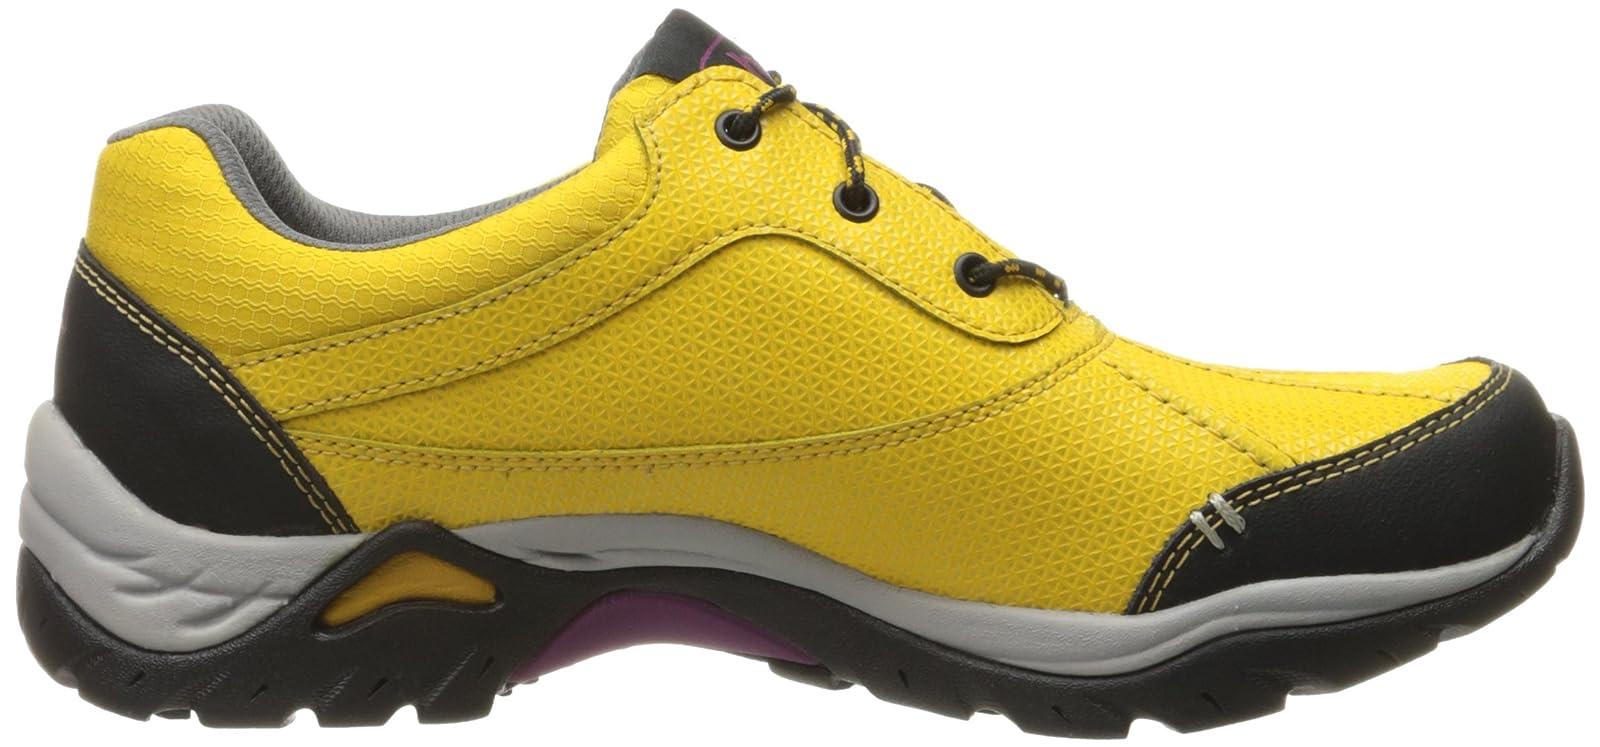 Ahnu Women's Calaveras Waterproof Hiking Shoe 5 M US - 7